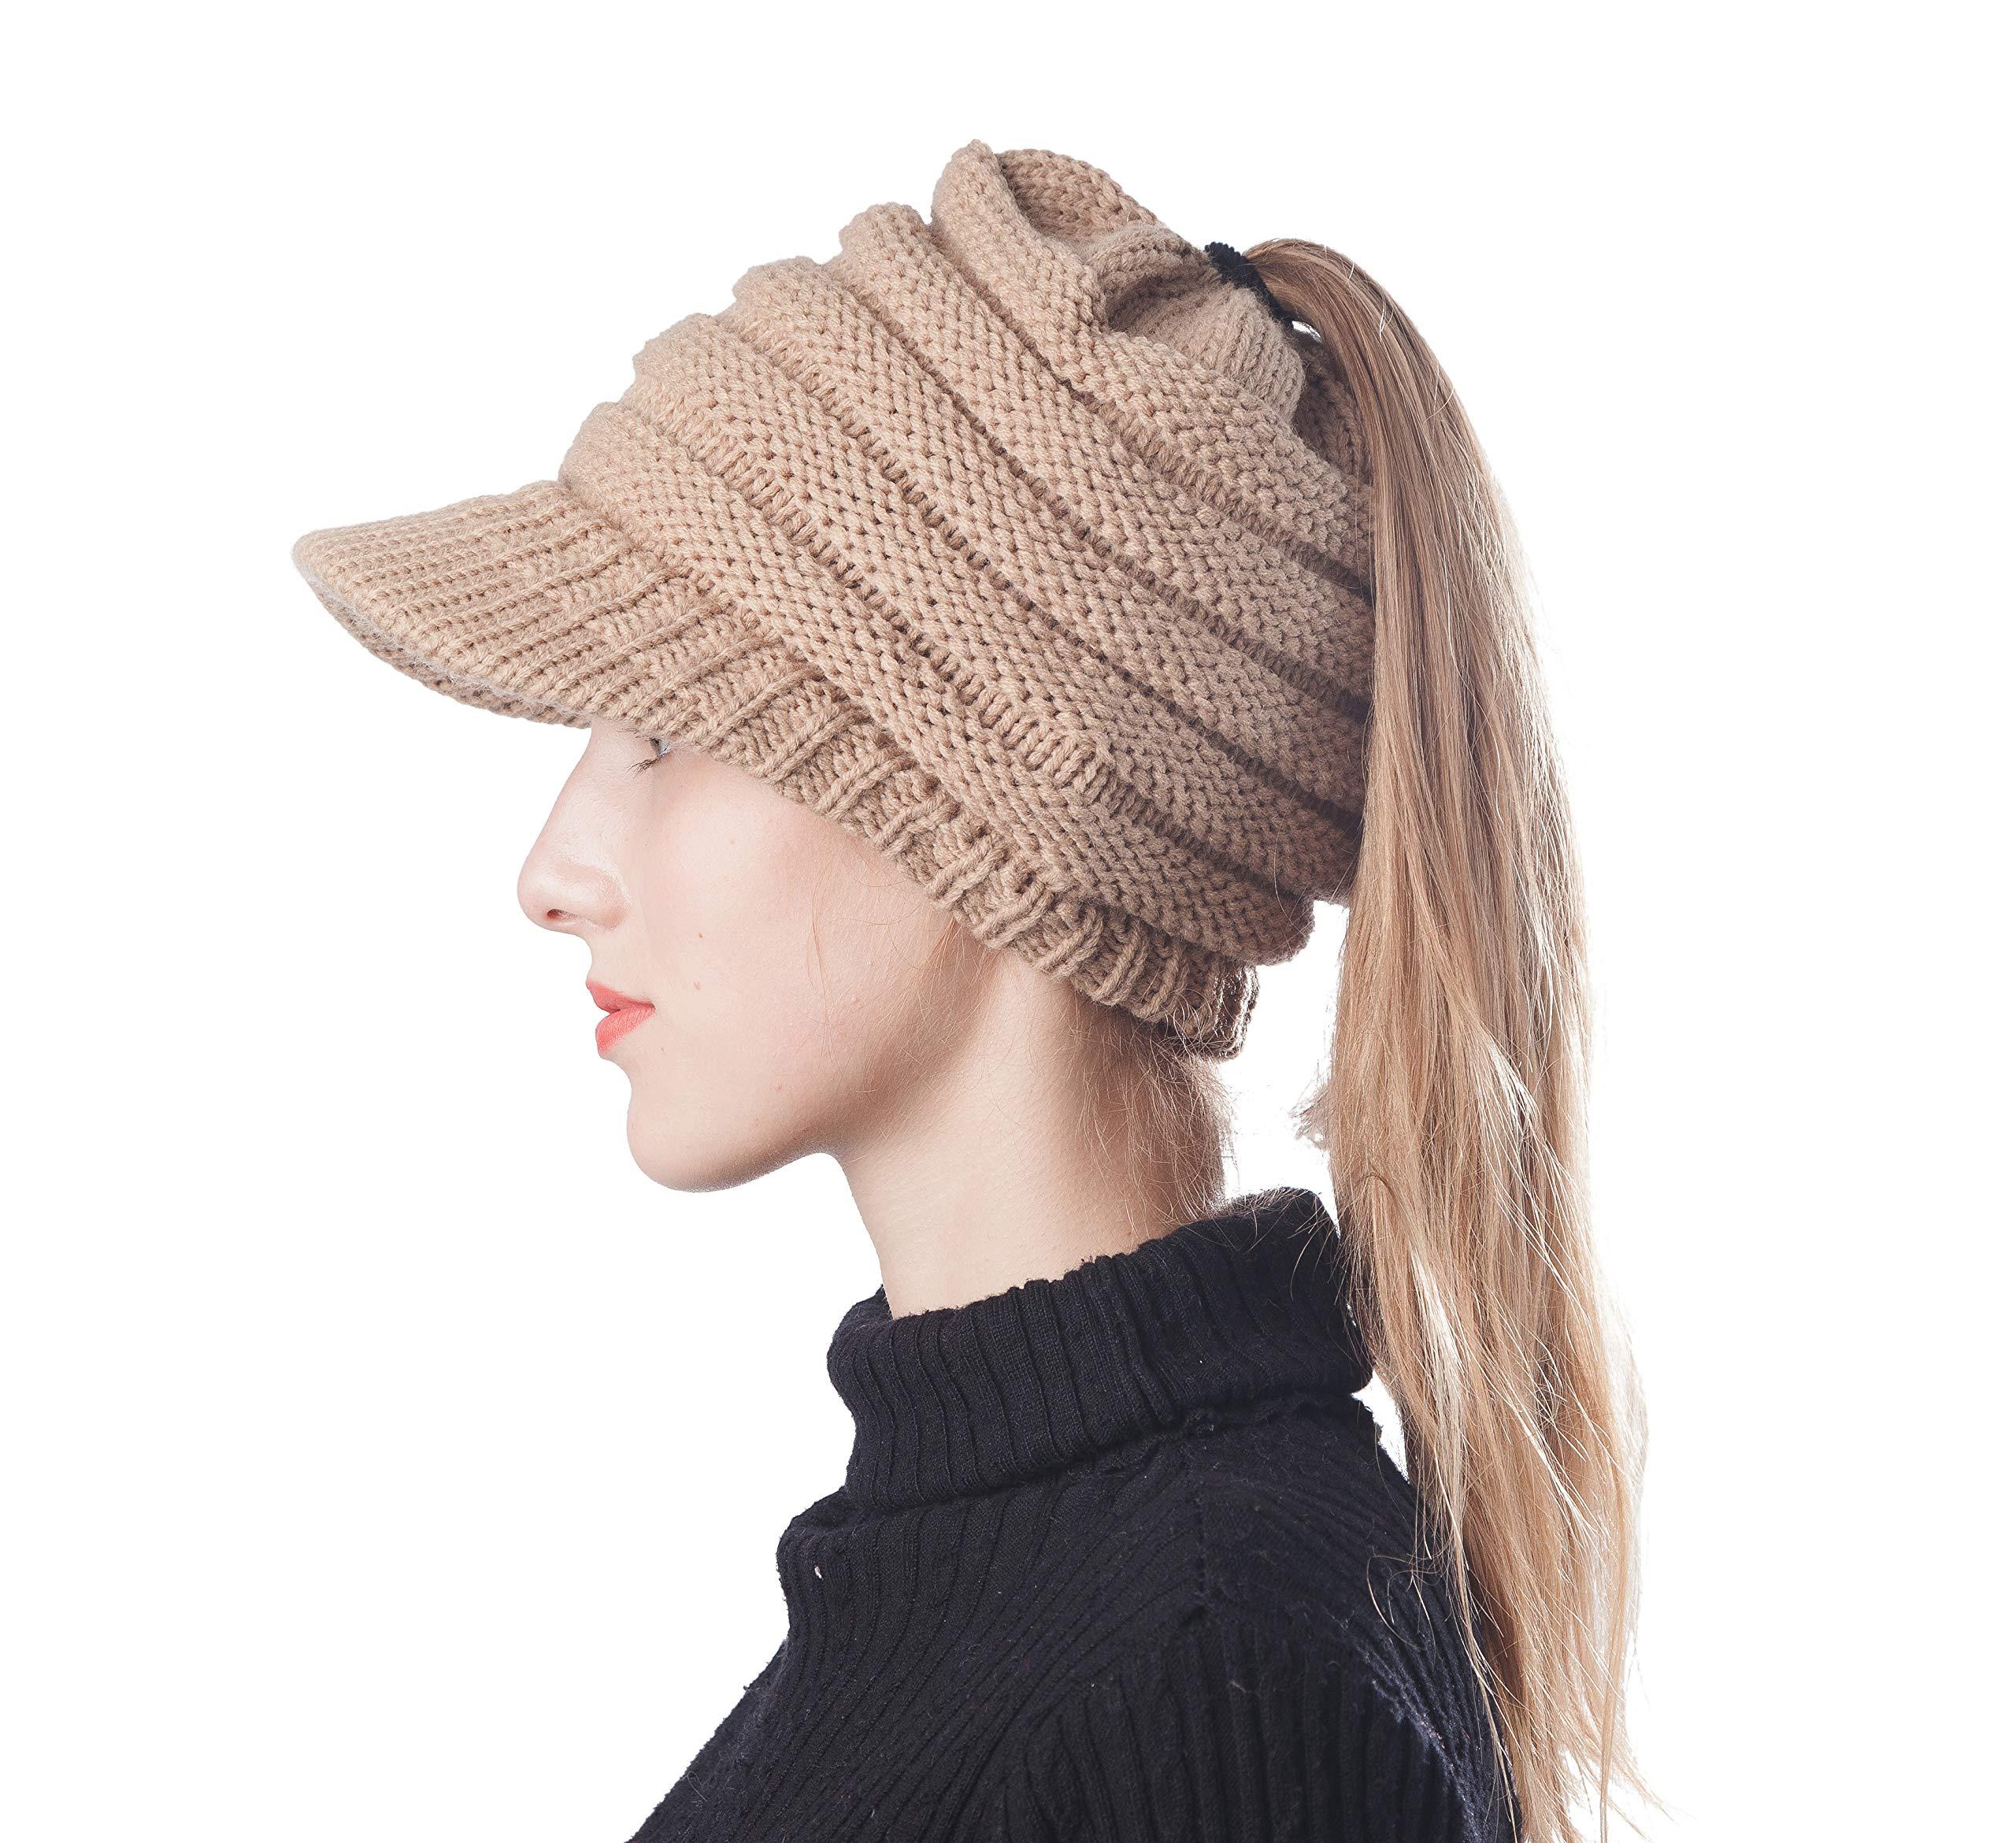 Scrub Green Beanie Hat Soft High Bun PonytailStretch Cable Knit Messy Winter Women Warm Visor Beanie Cap (Visor Camel-2)